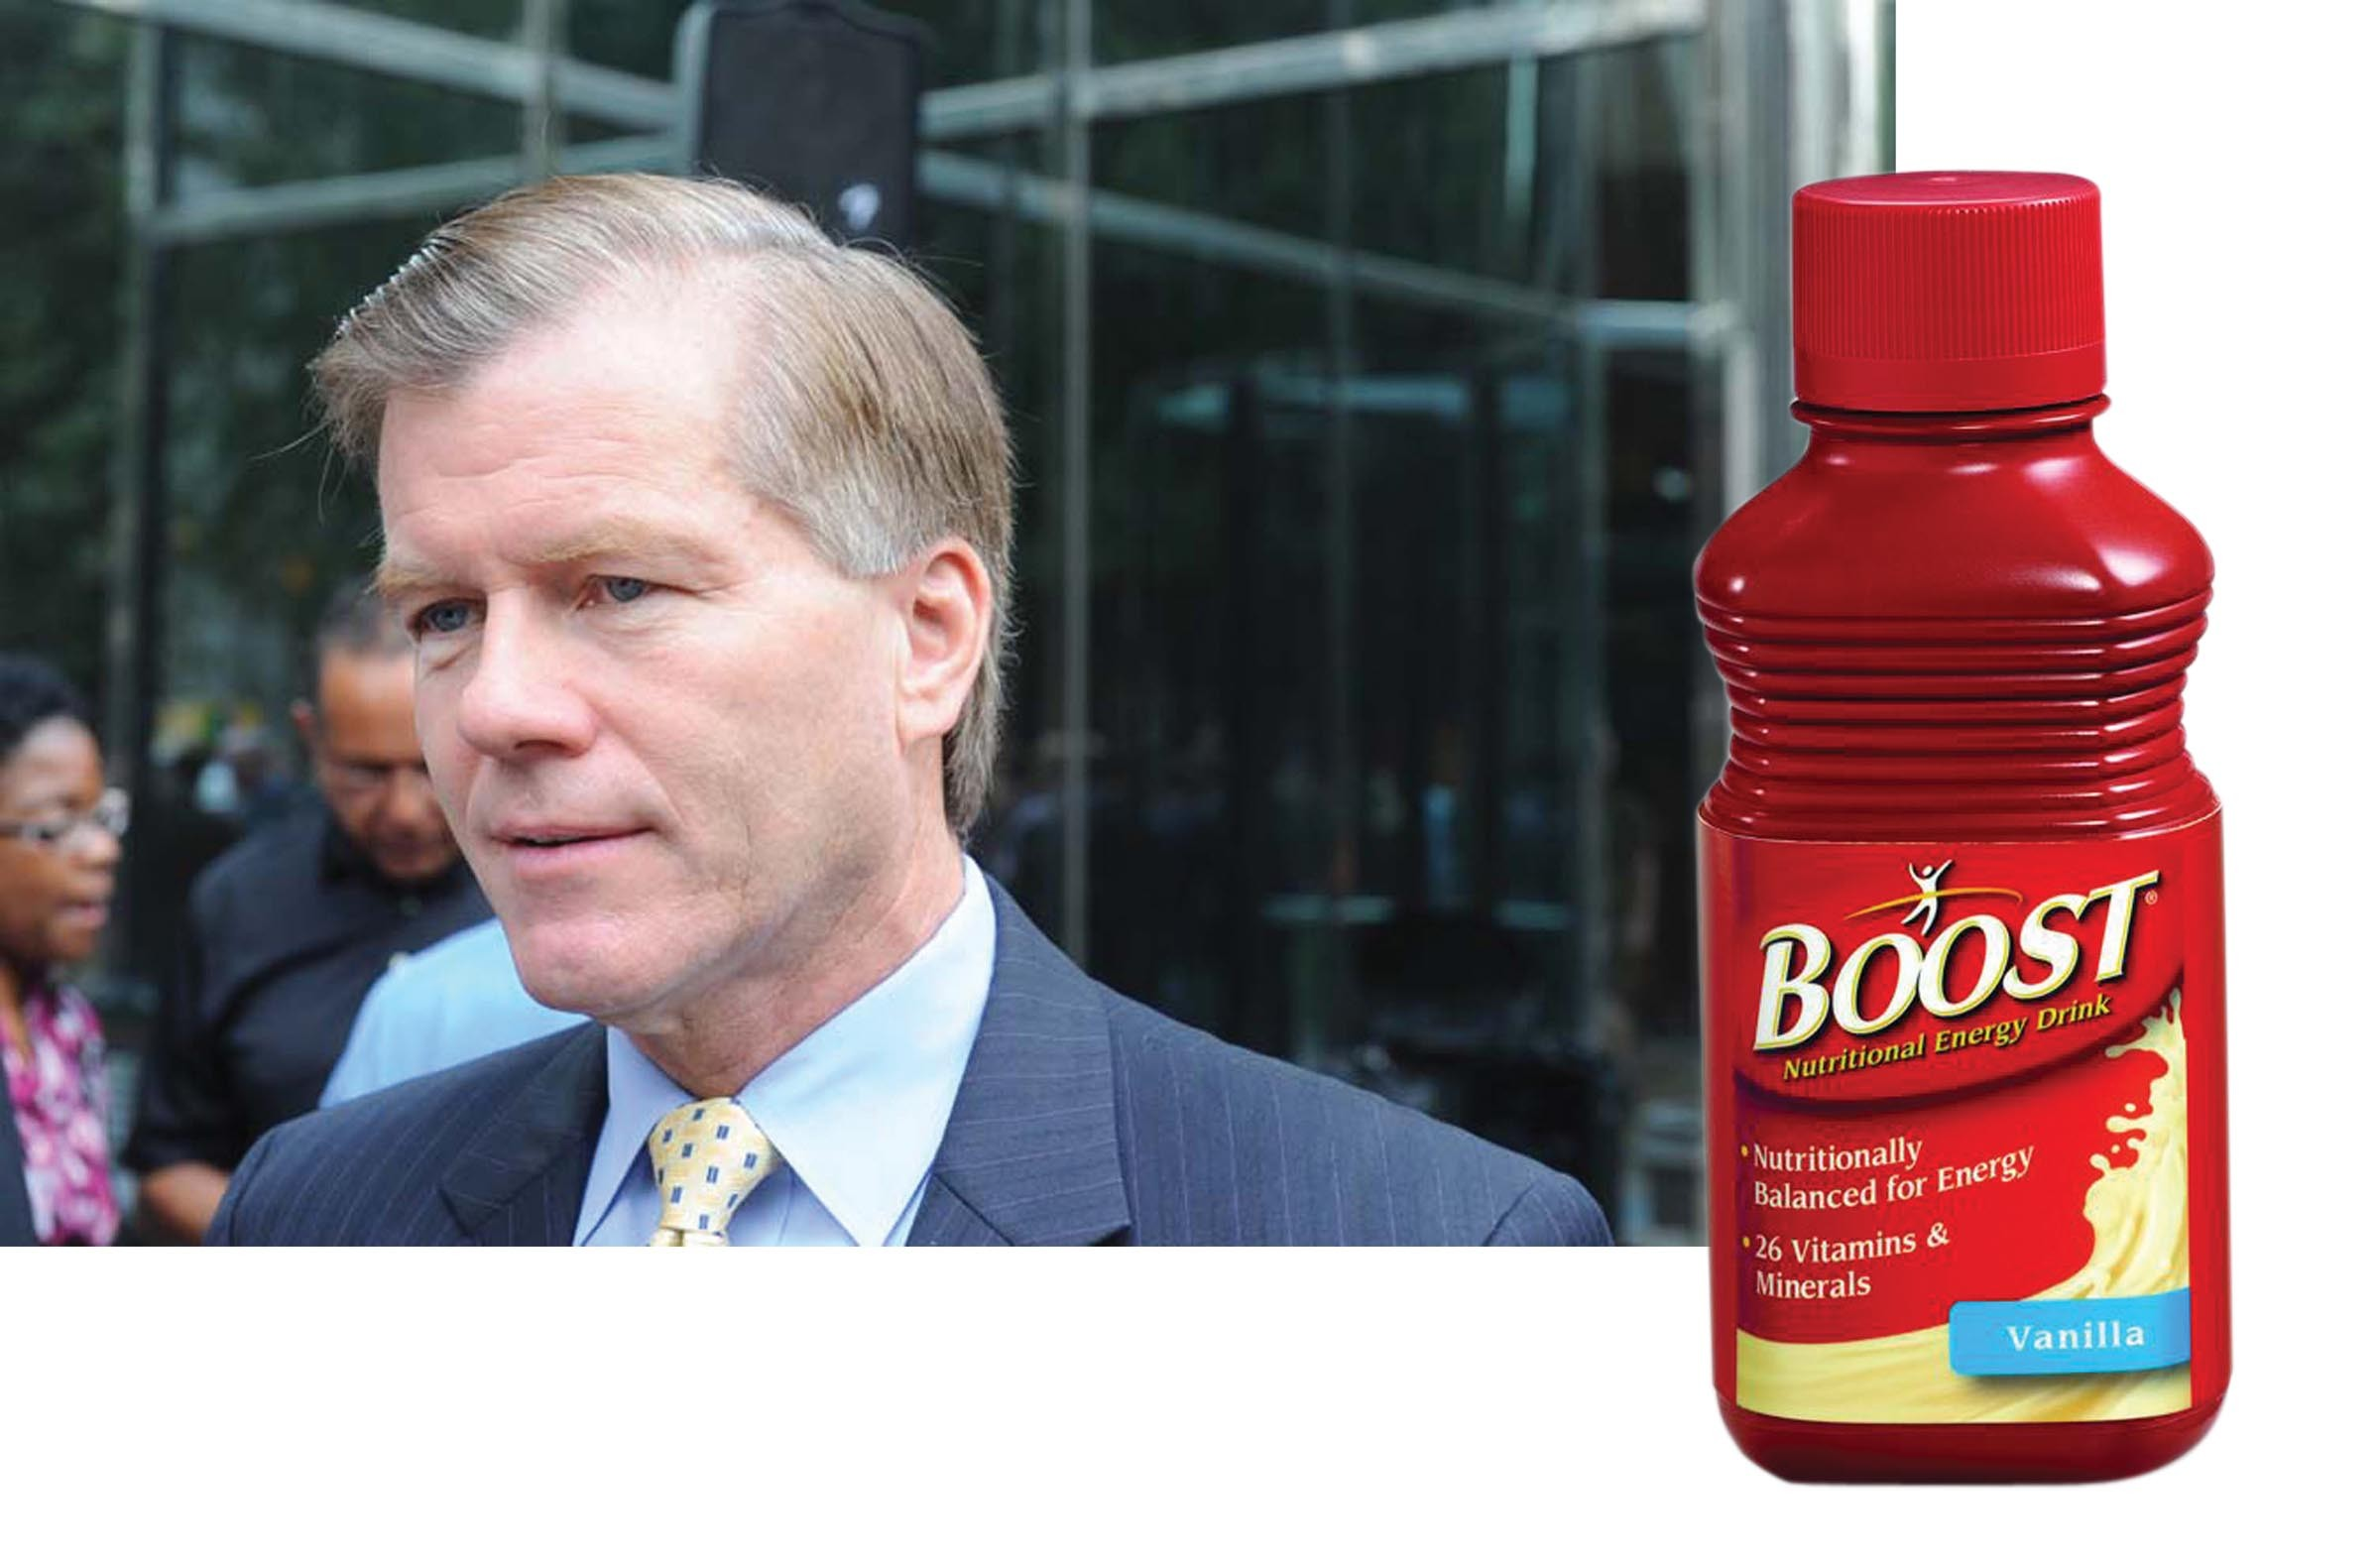 The McDonnells prefer liquid energy for breakfast. - SCOTT ELMQUIST